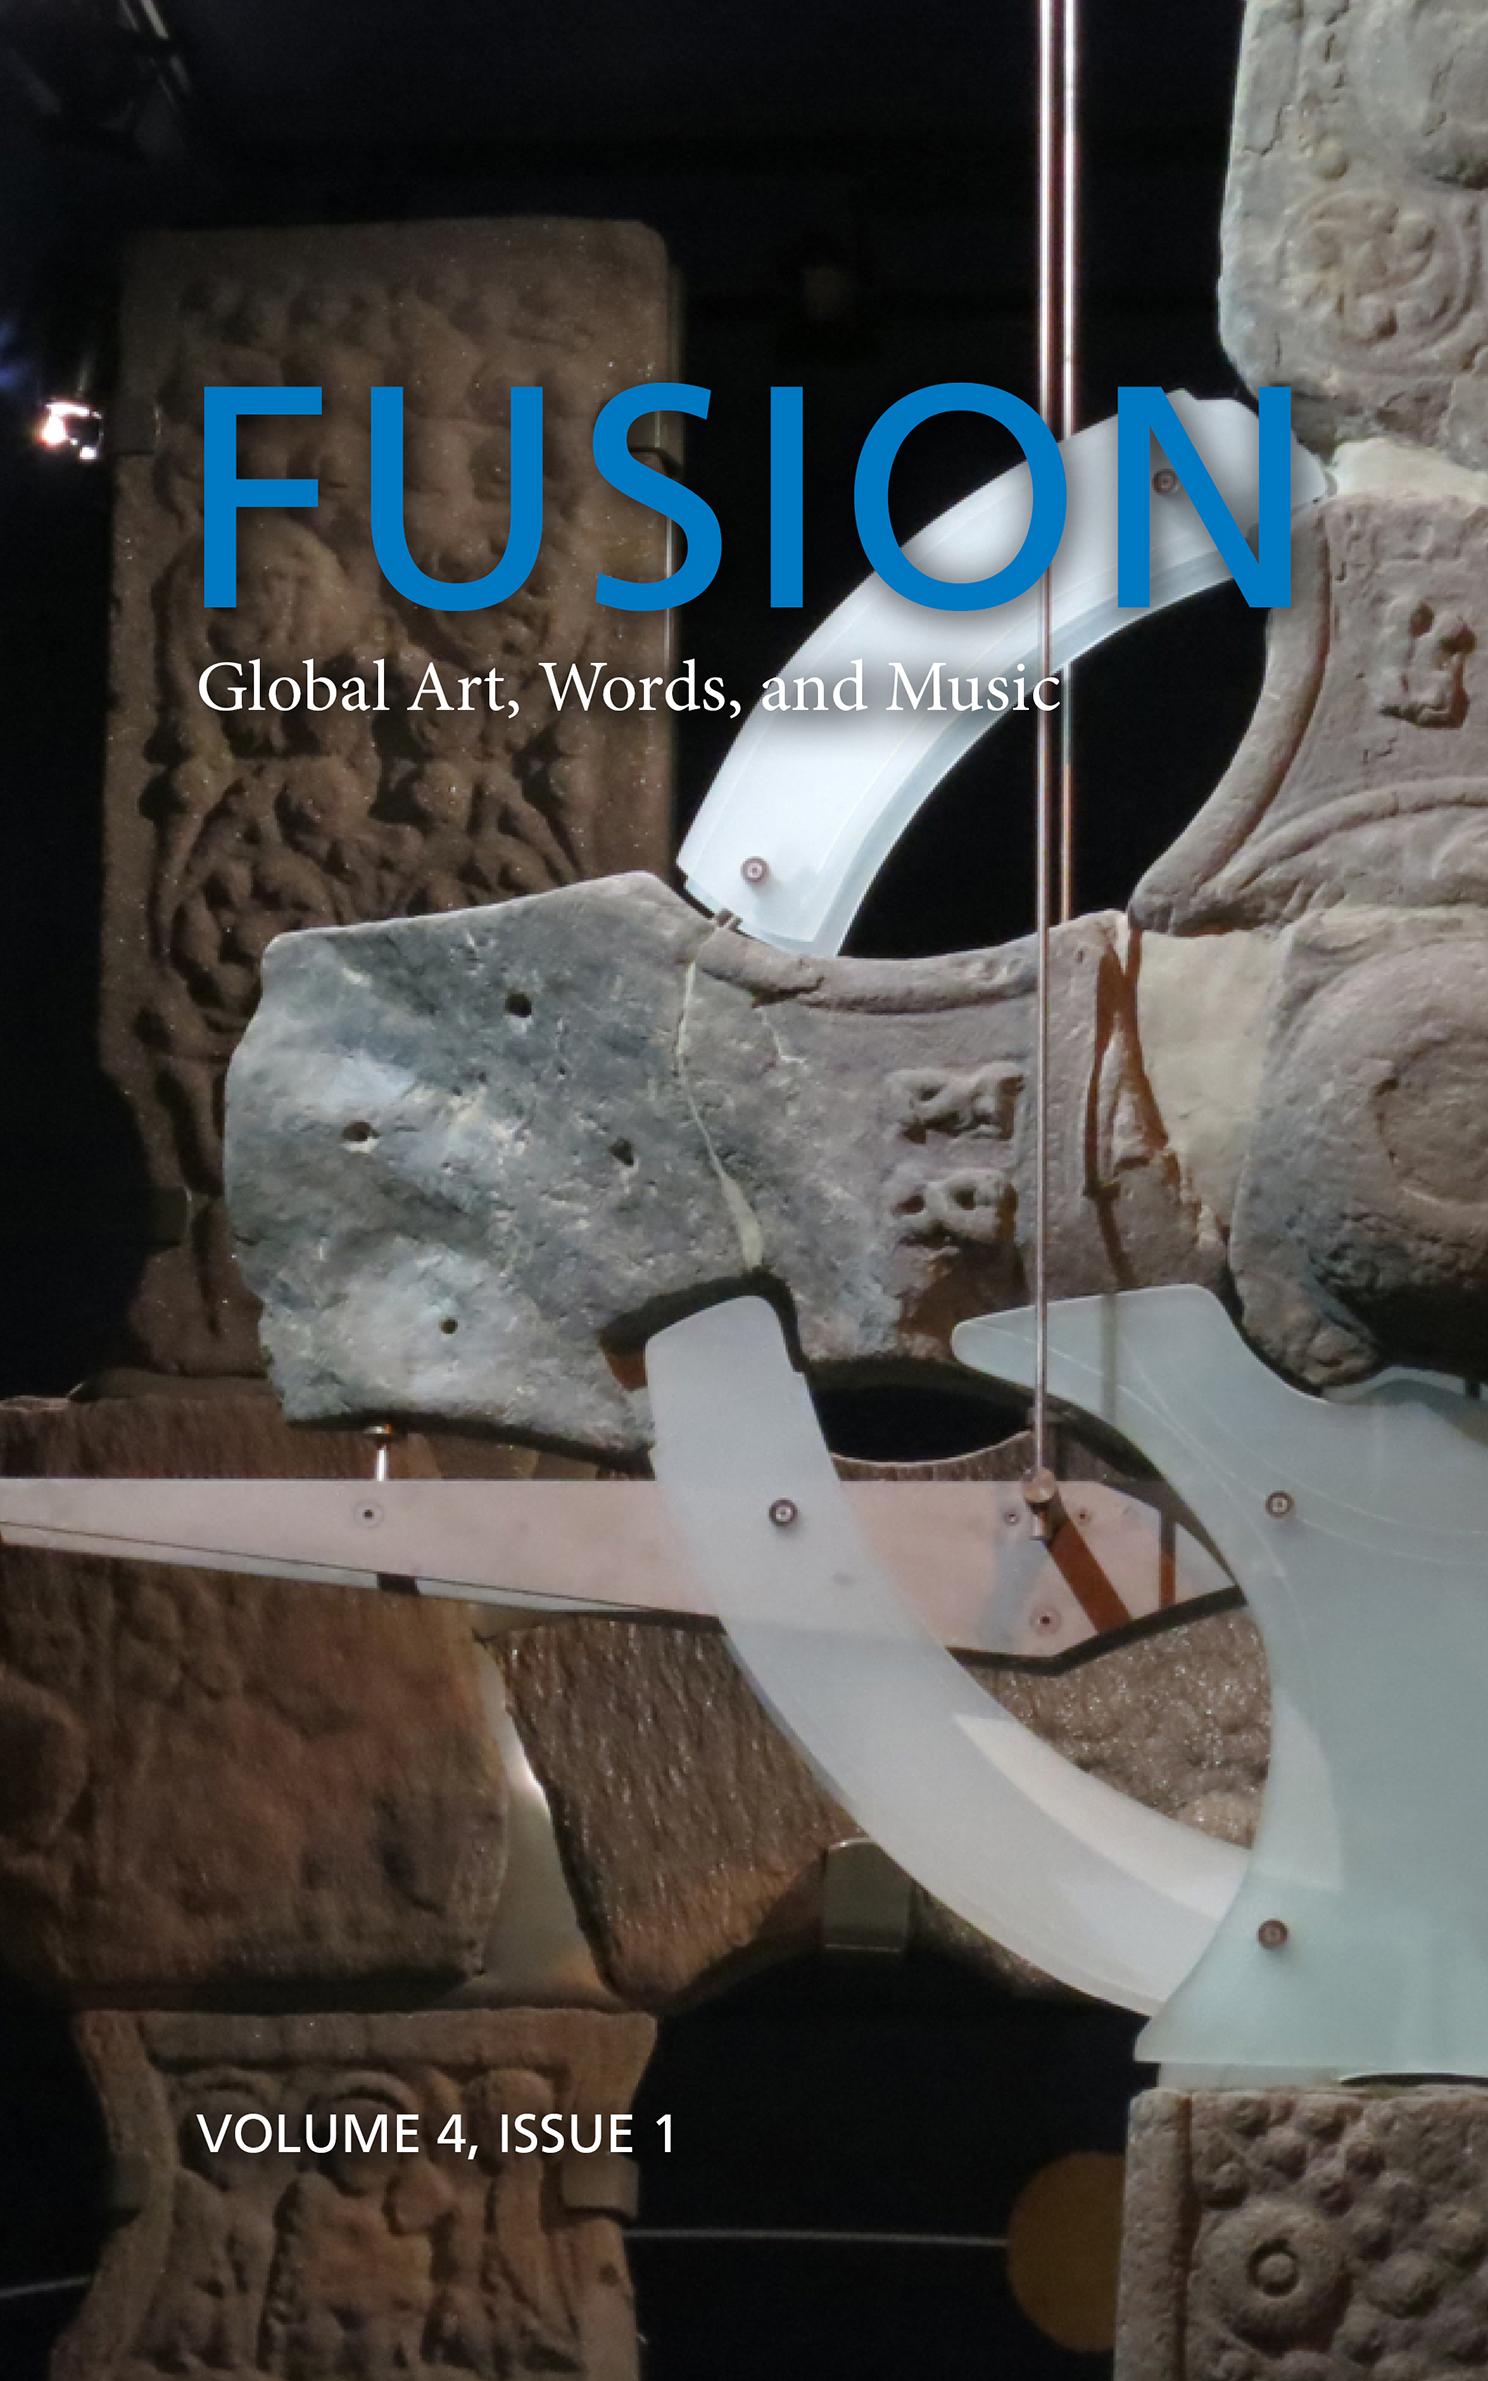 FUSION Volume 4